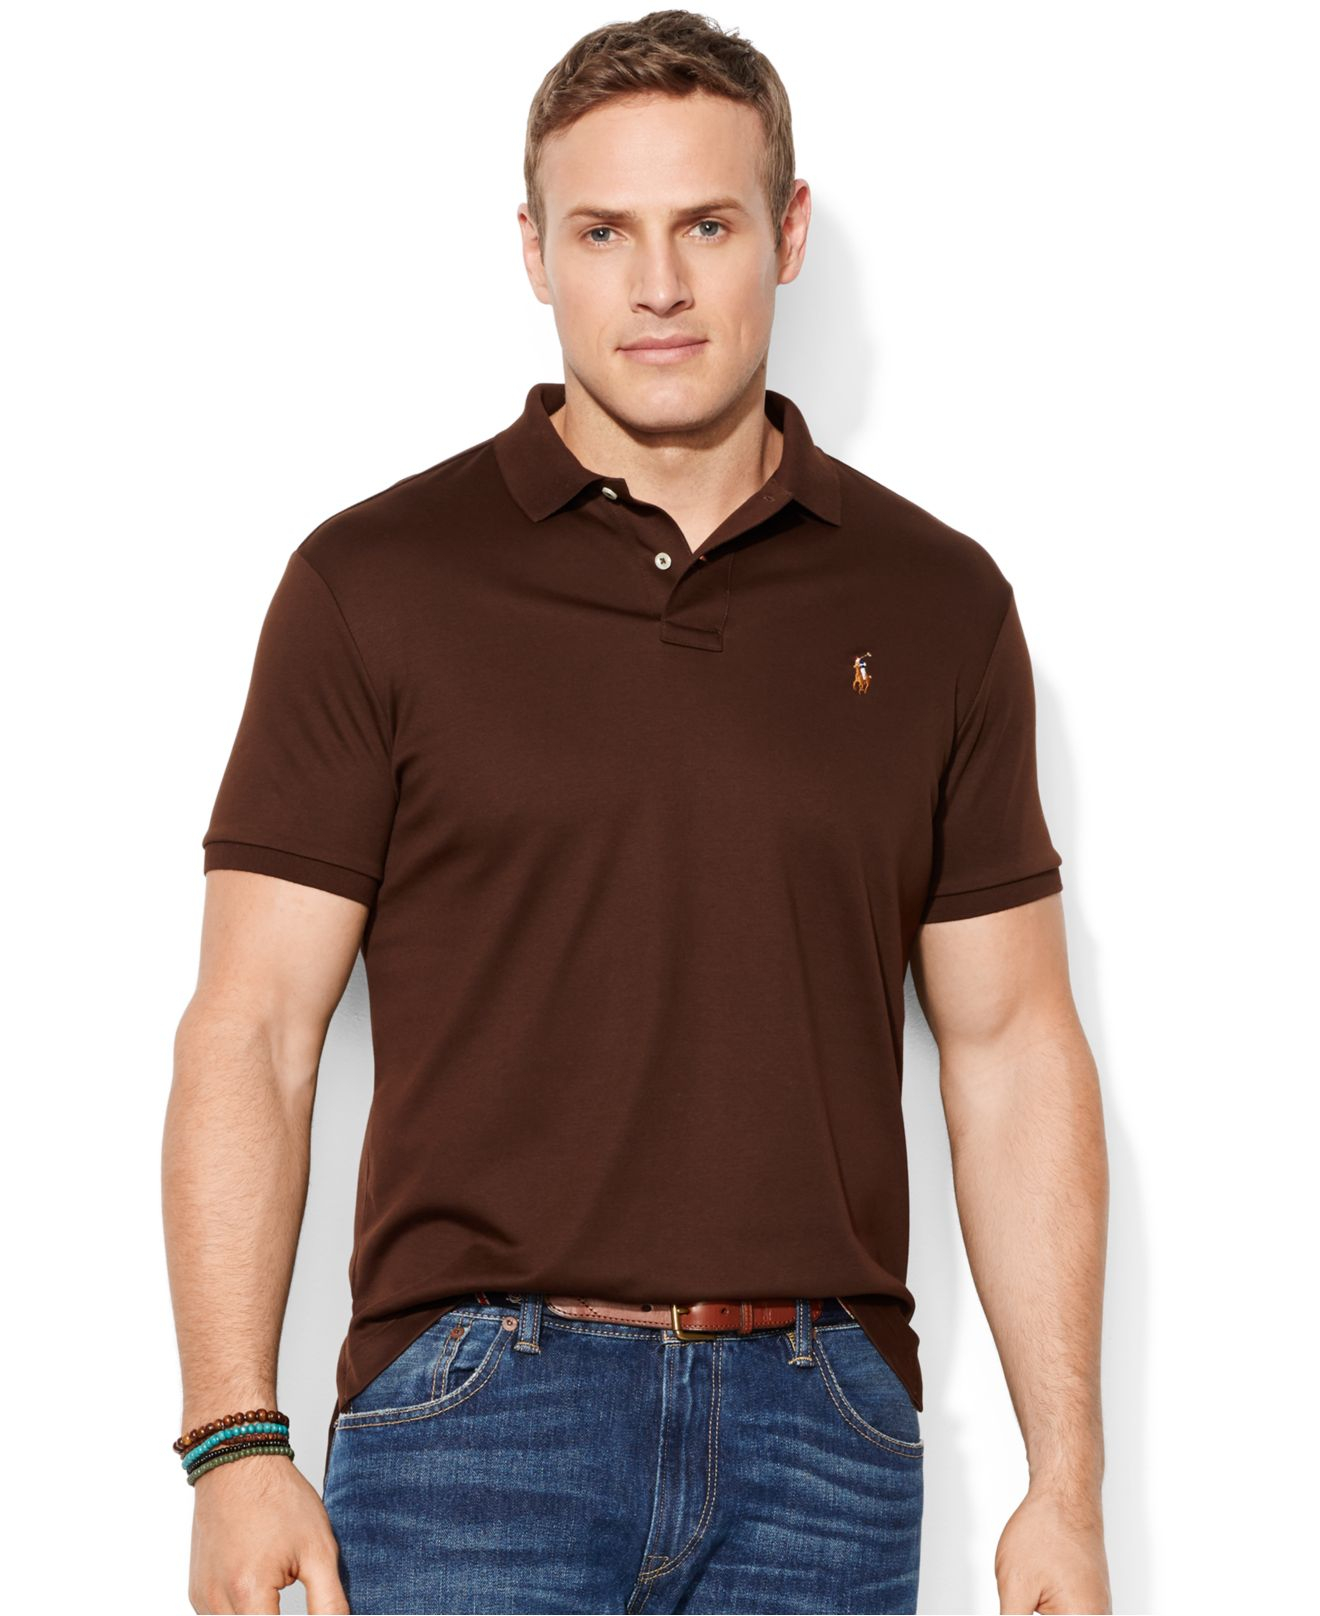 4bcf4b4b4b2c Polo Ralph Lauren Mens Pima Soft Touch Interlock Polo Shirt ...